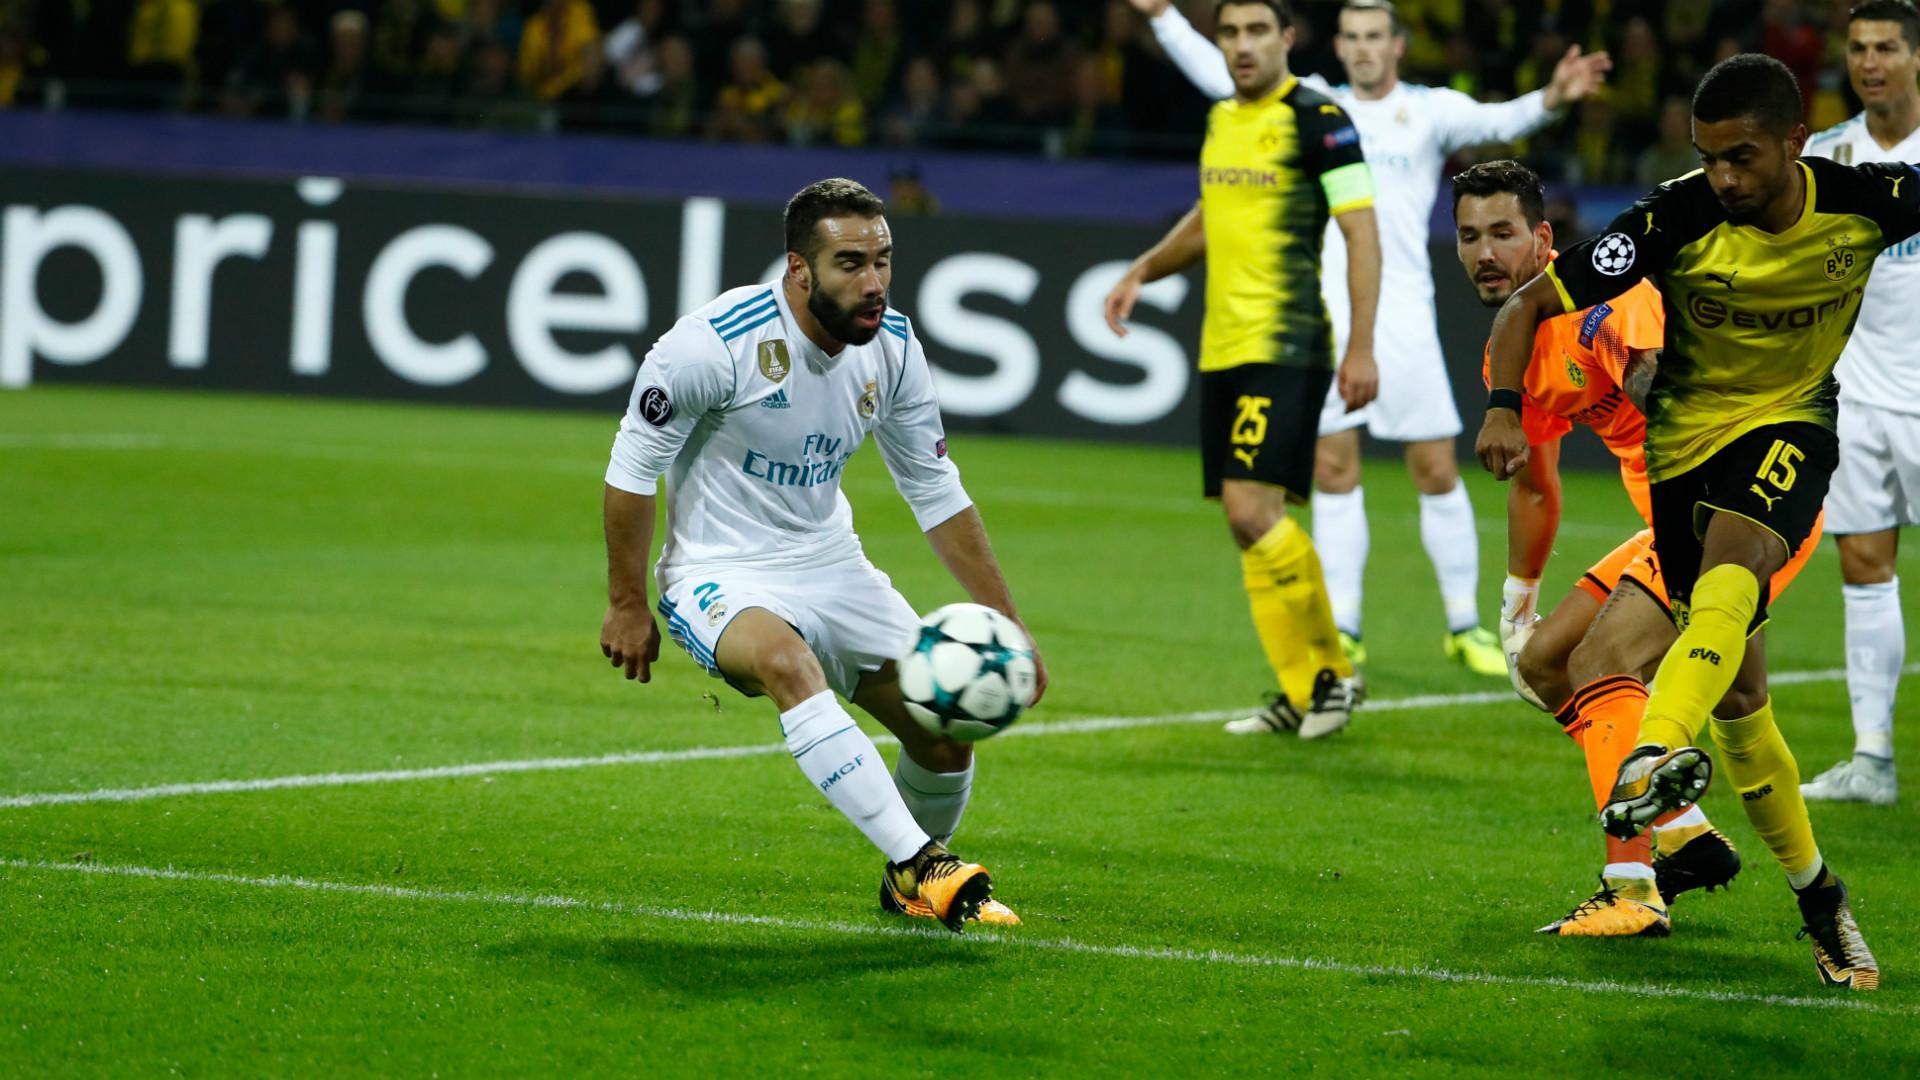 Carvajal Borussia Dortmund Real Madrid Champions League